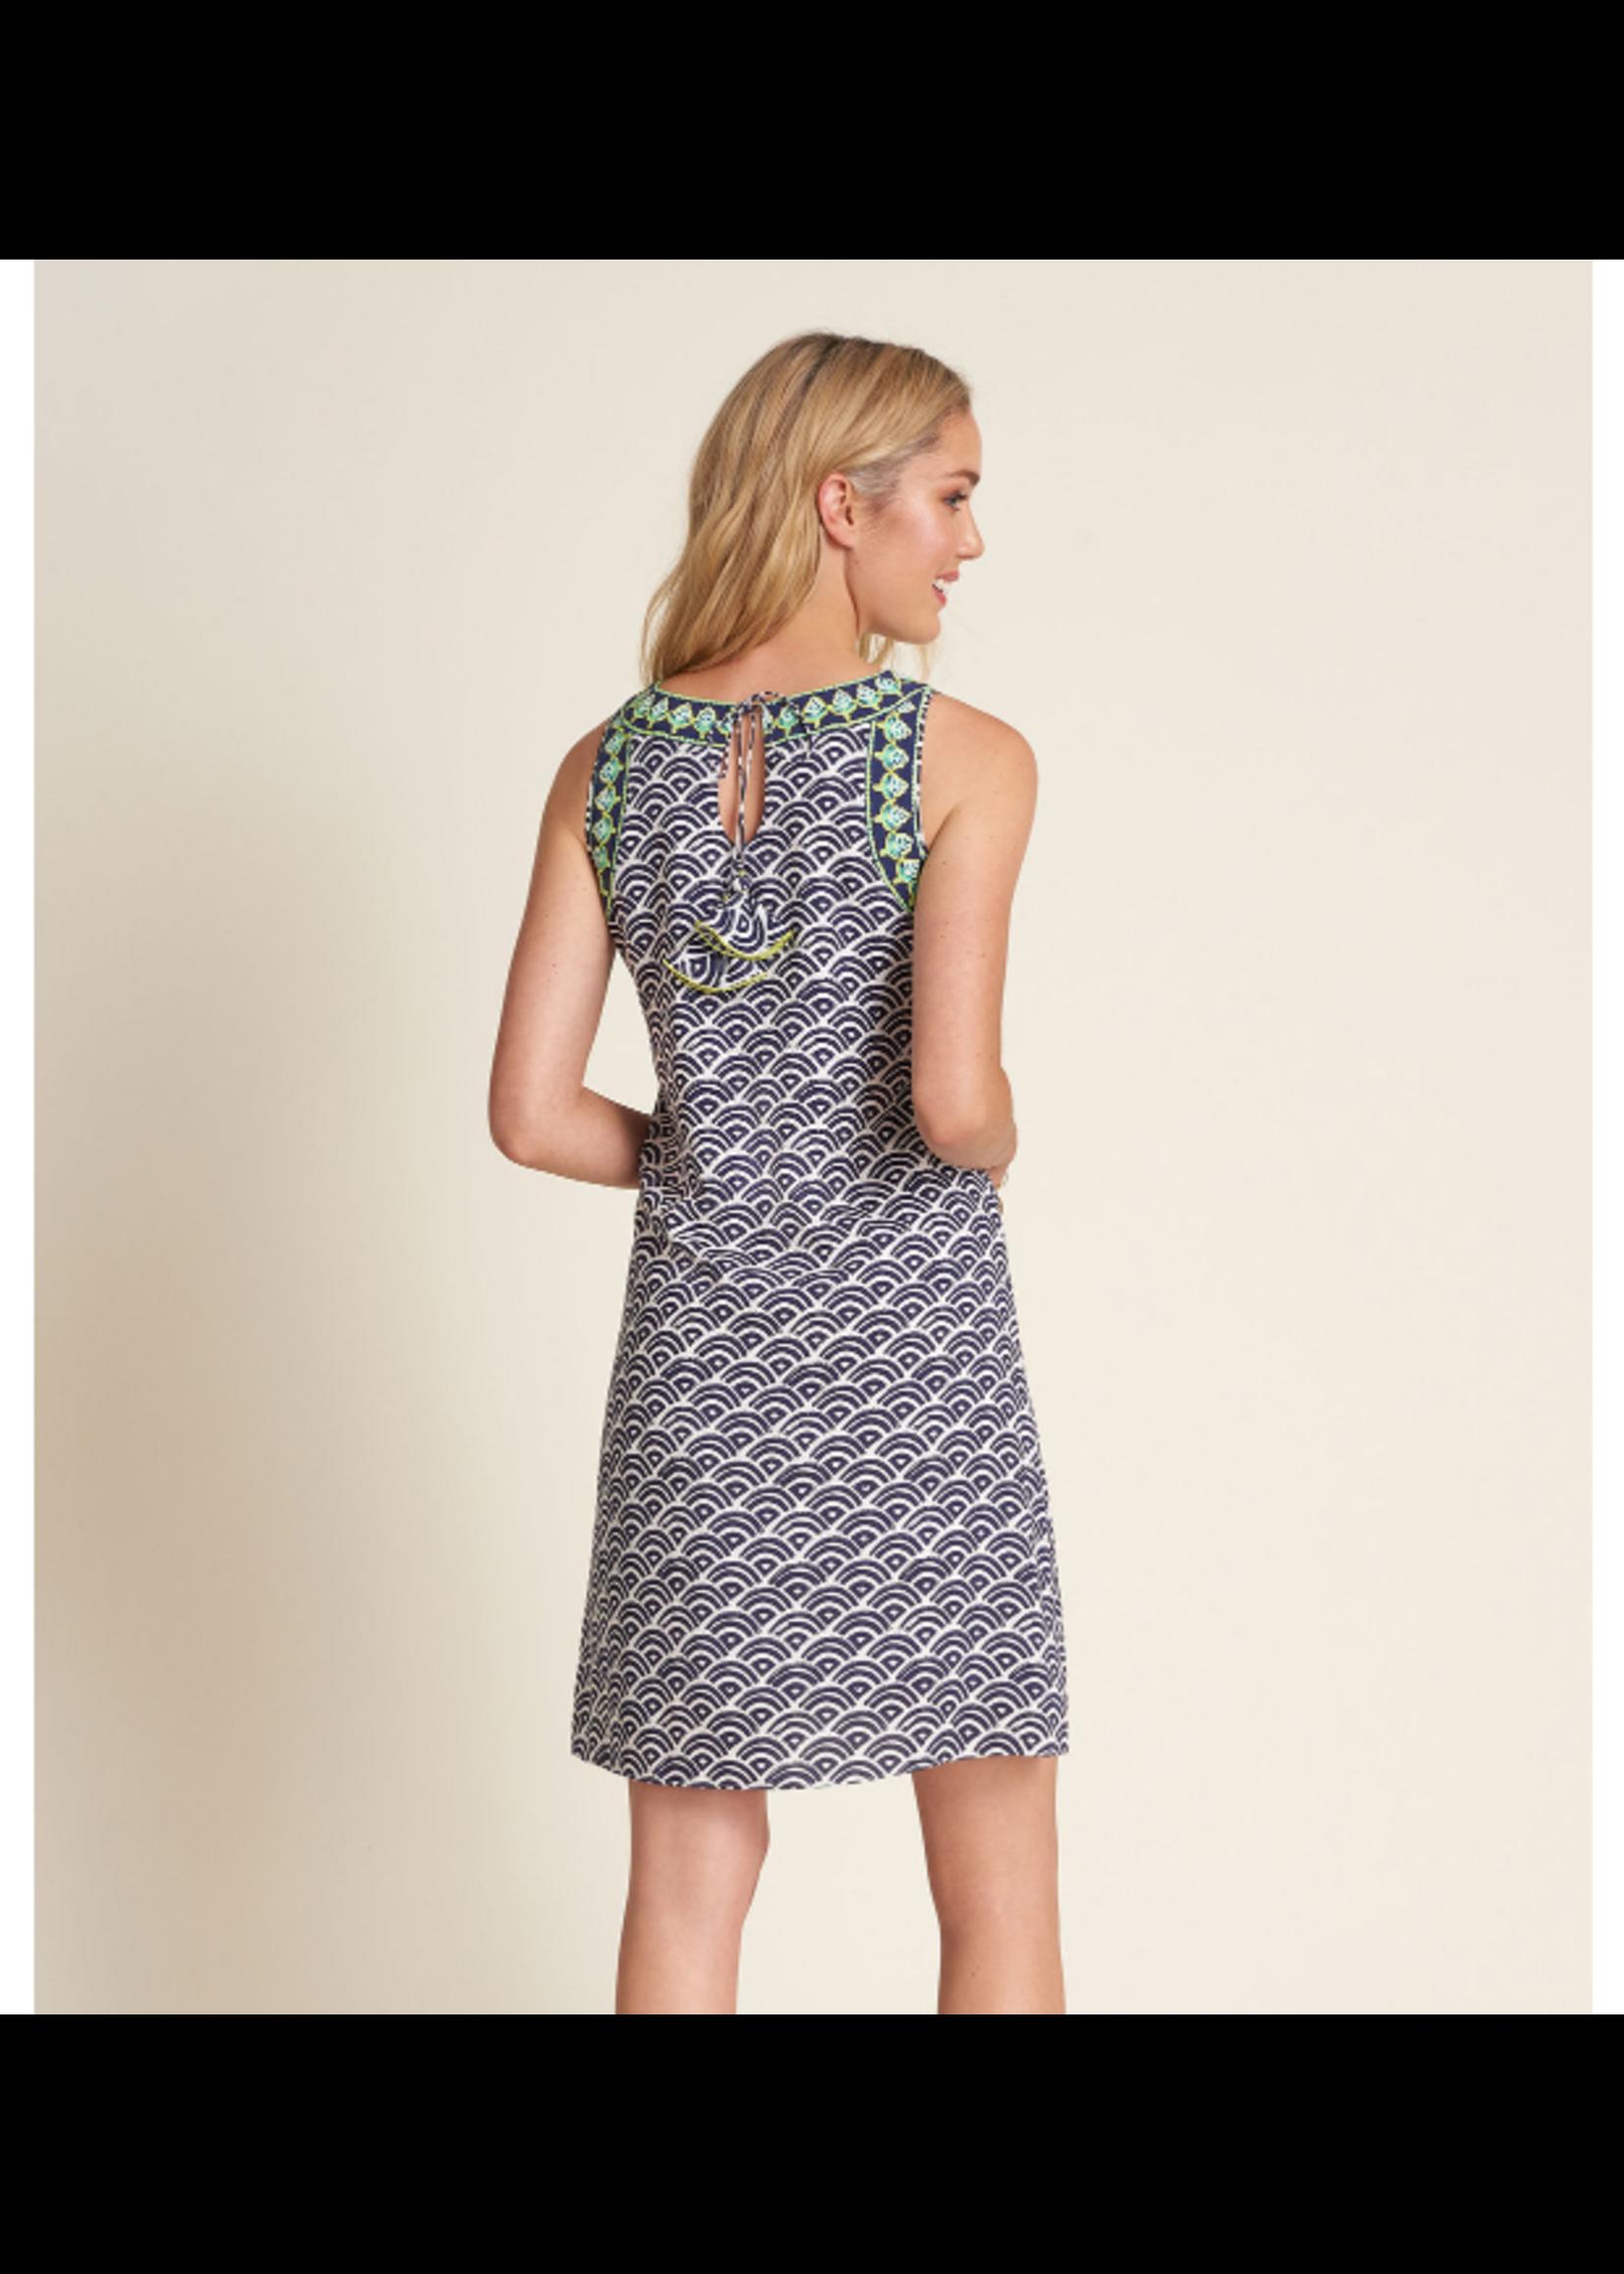 Hatley Meghan Dress